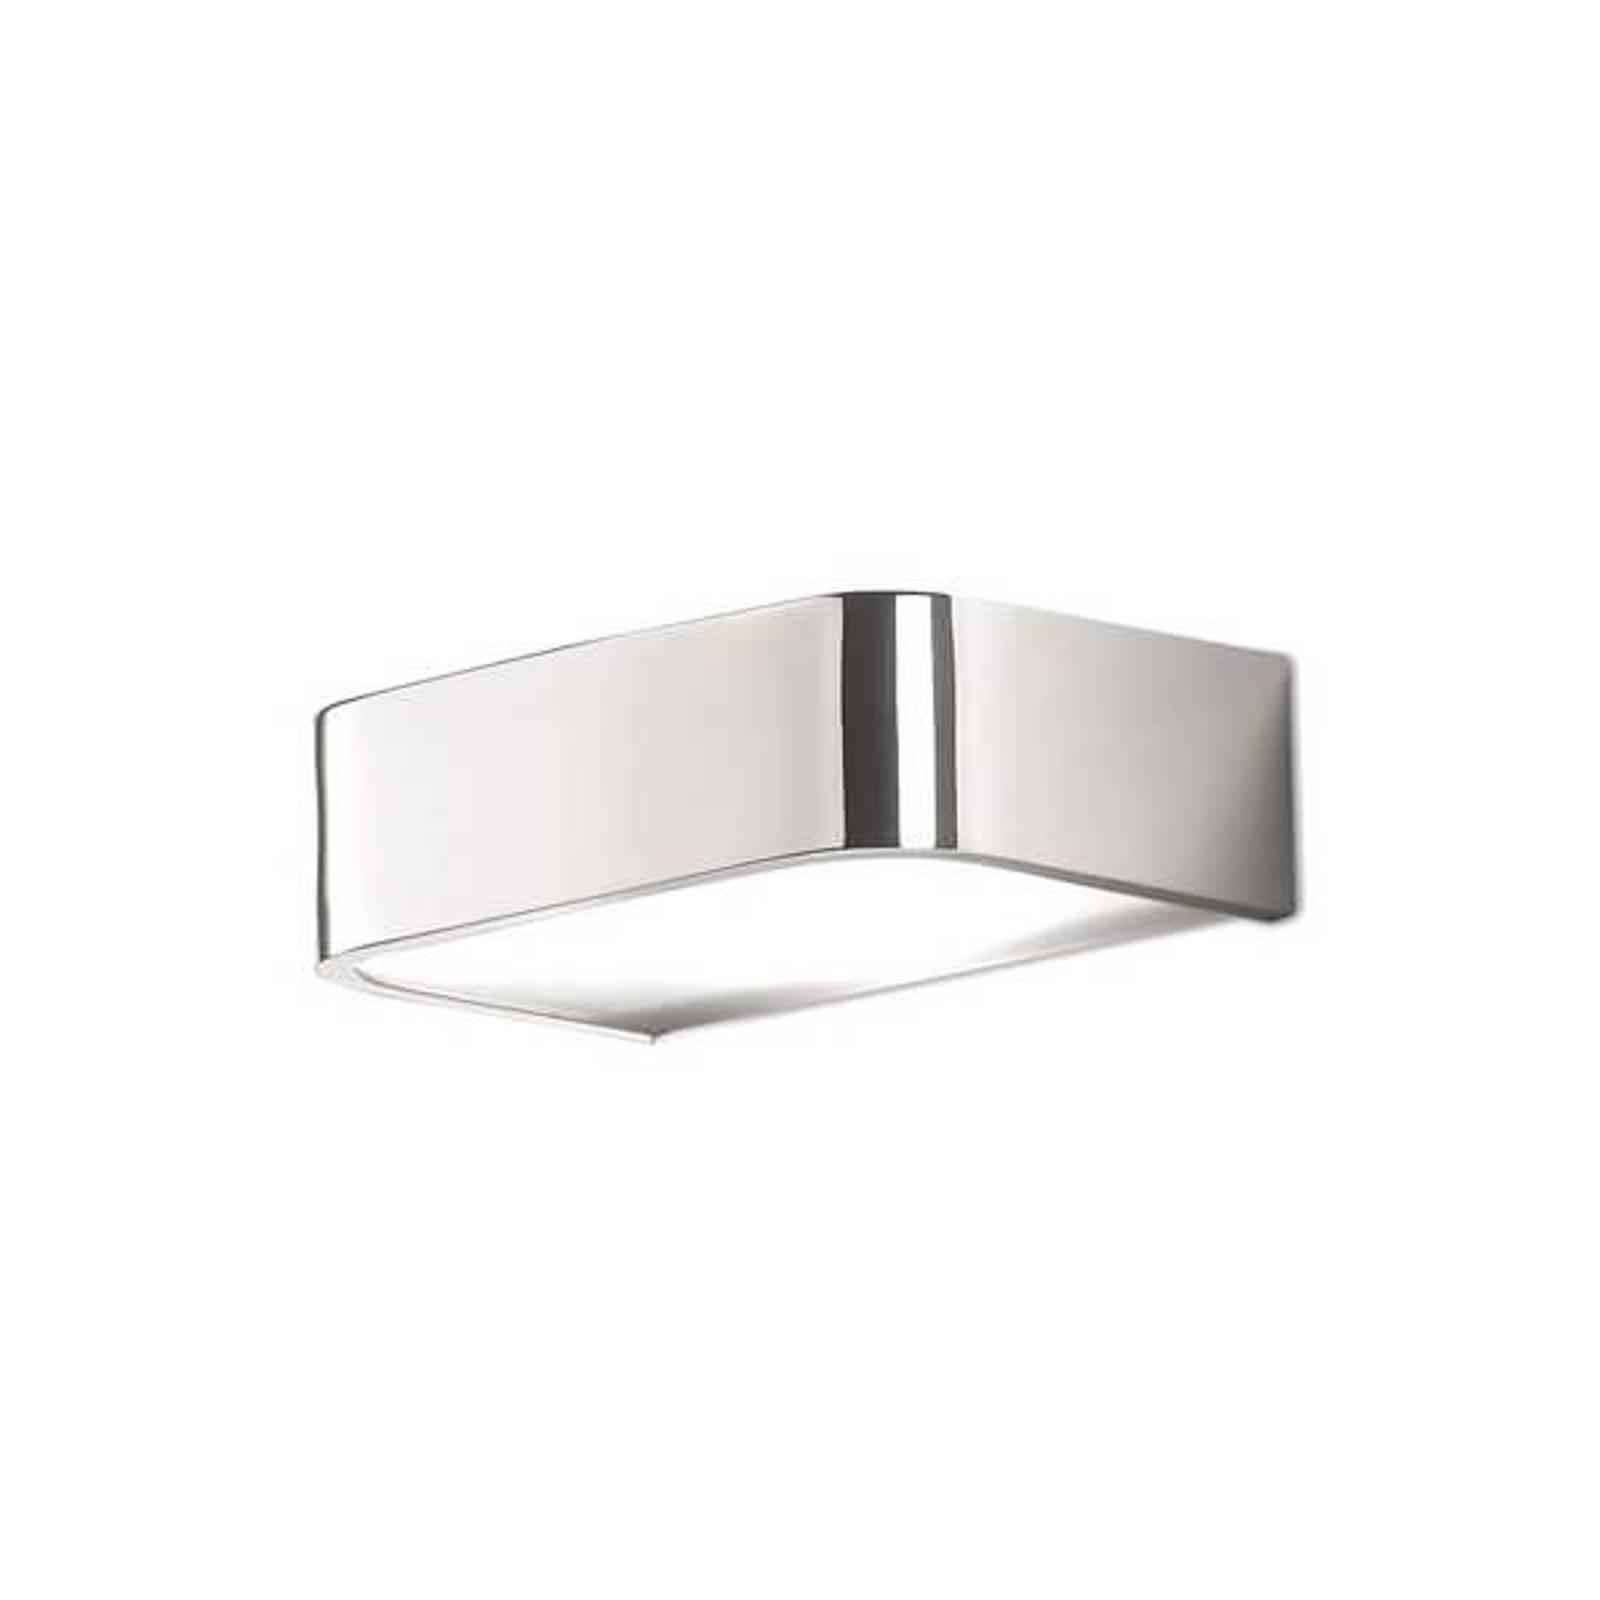 Badezimmer-Wandleuchte Arcos mit LED, 15 cm chrom